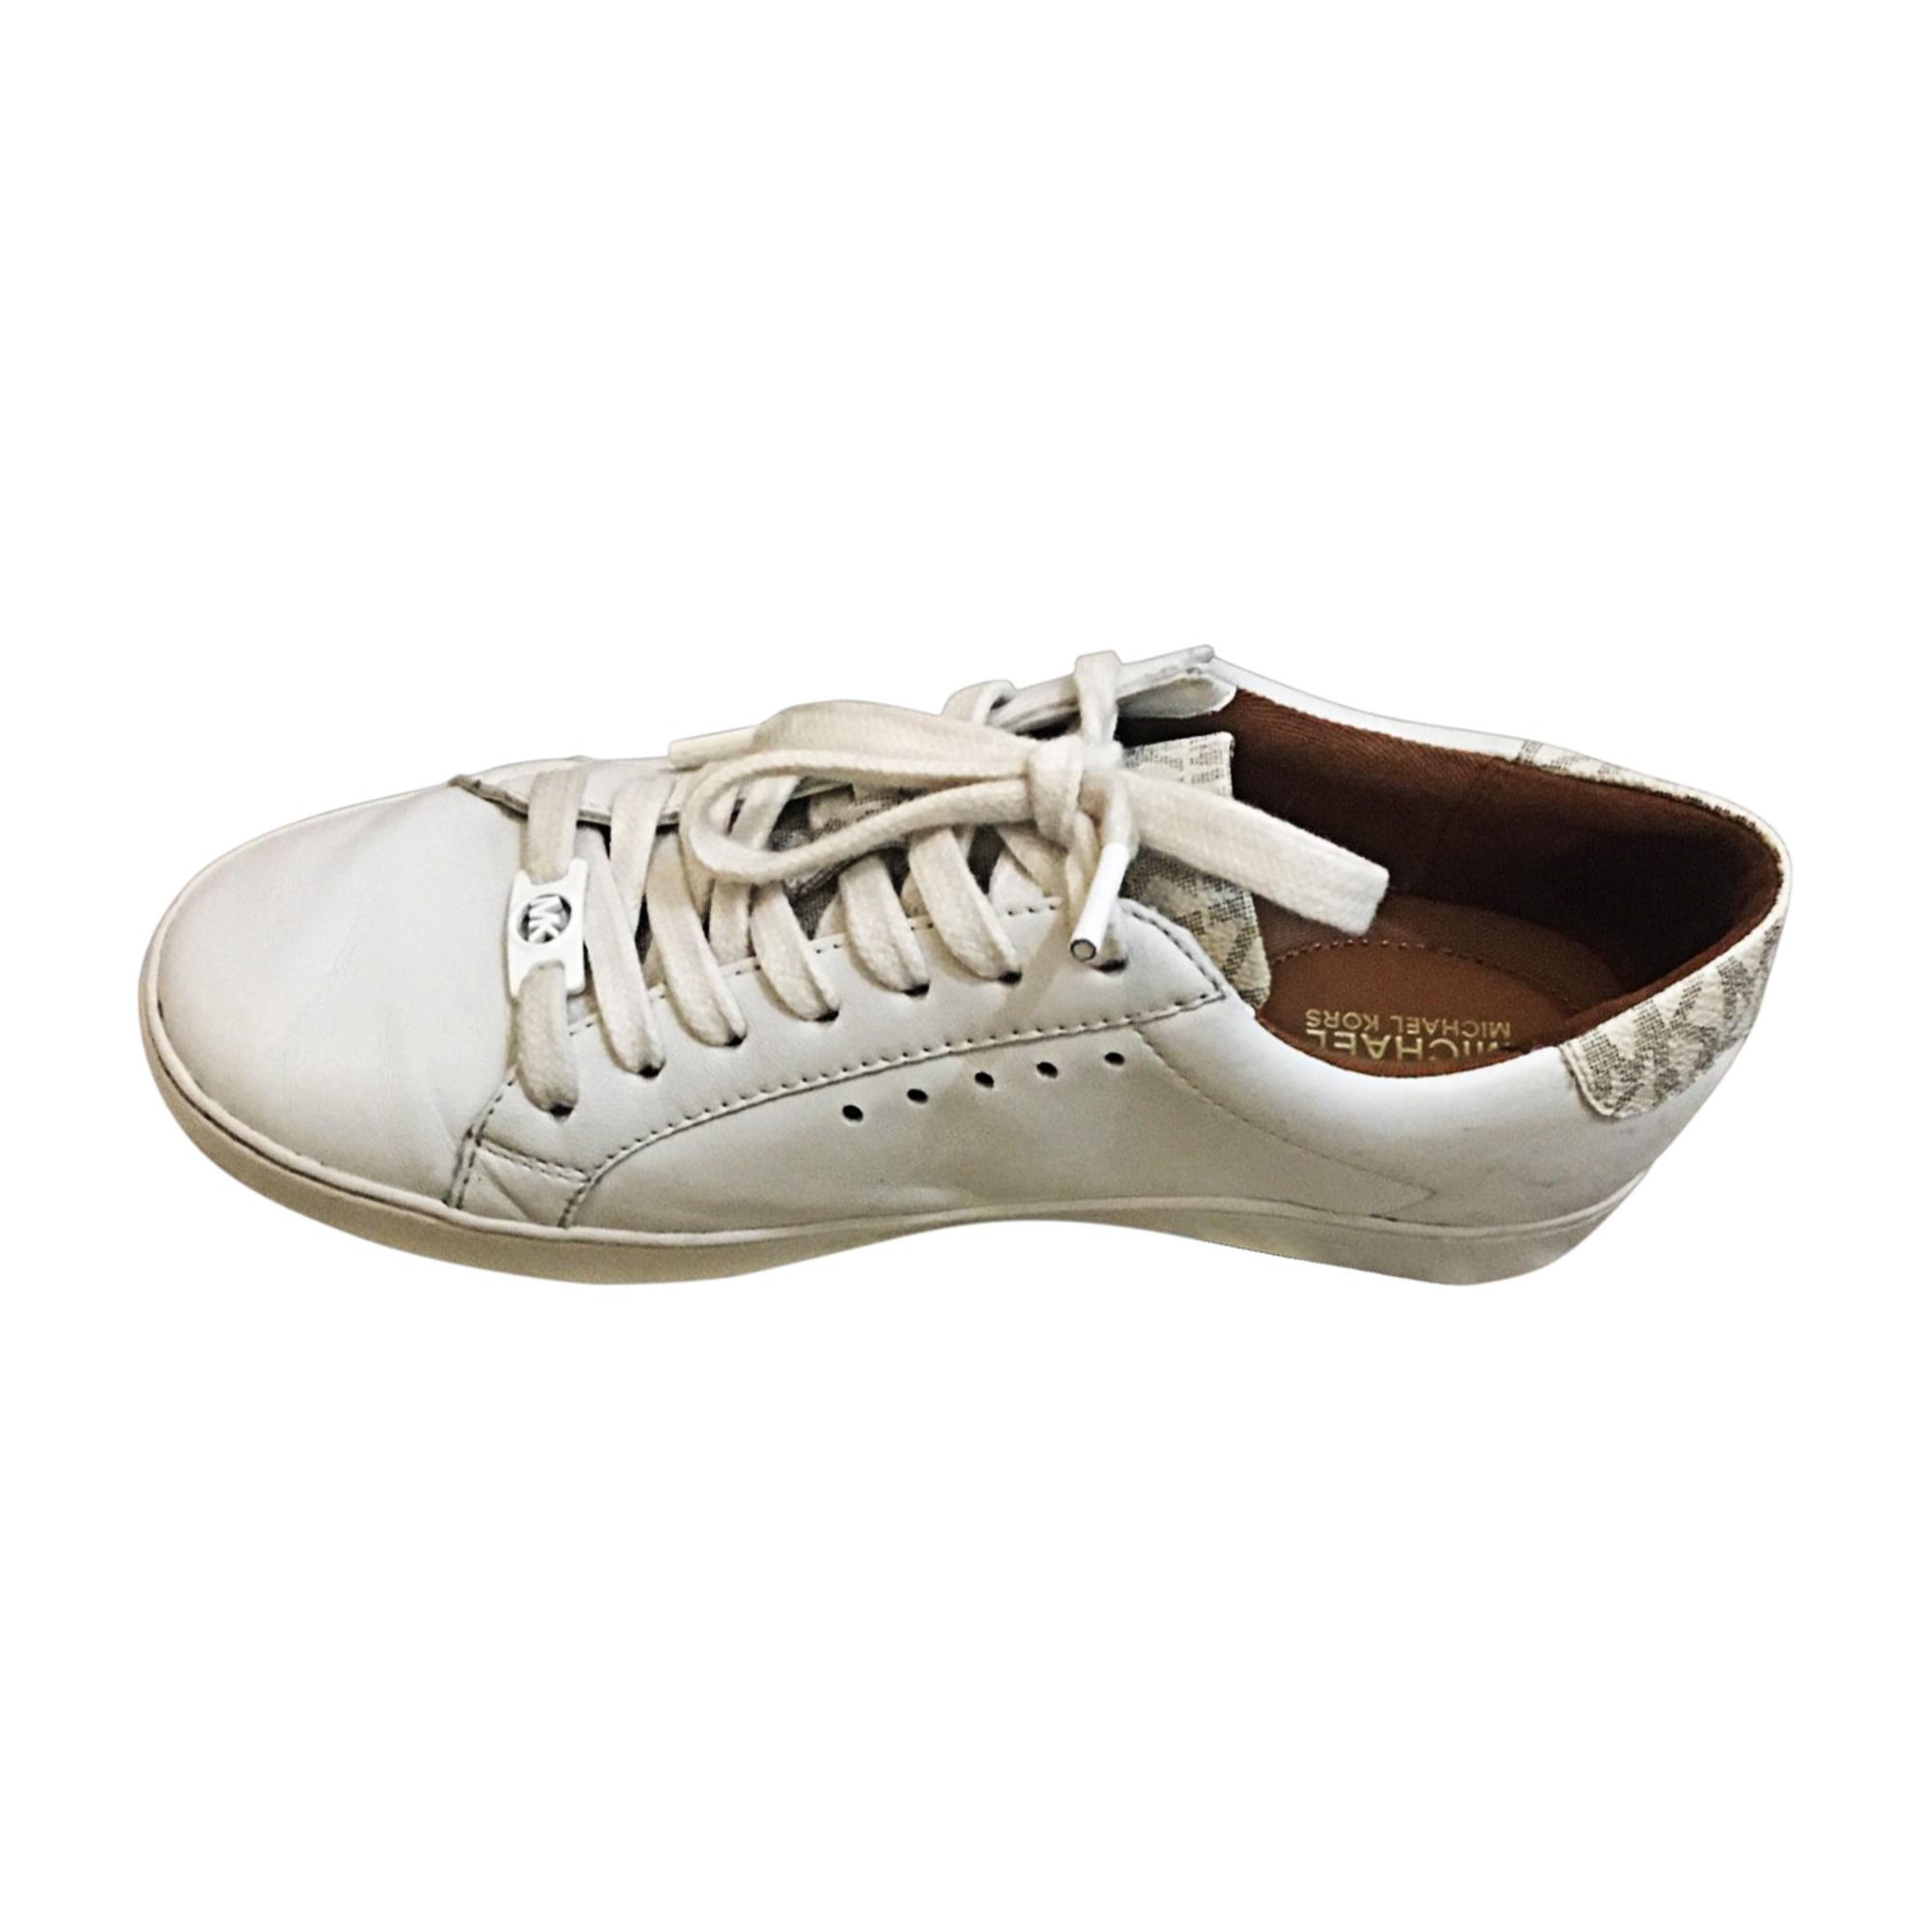 Sneakers MICHAEL KORS White, off-white, ecru